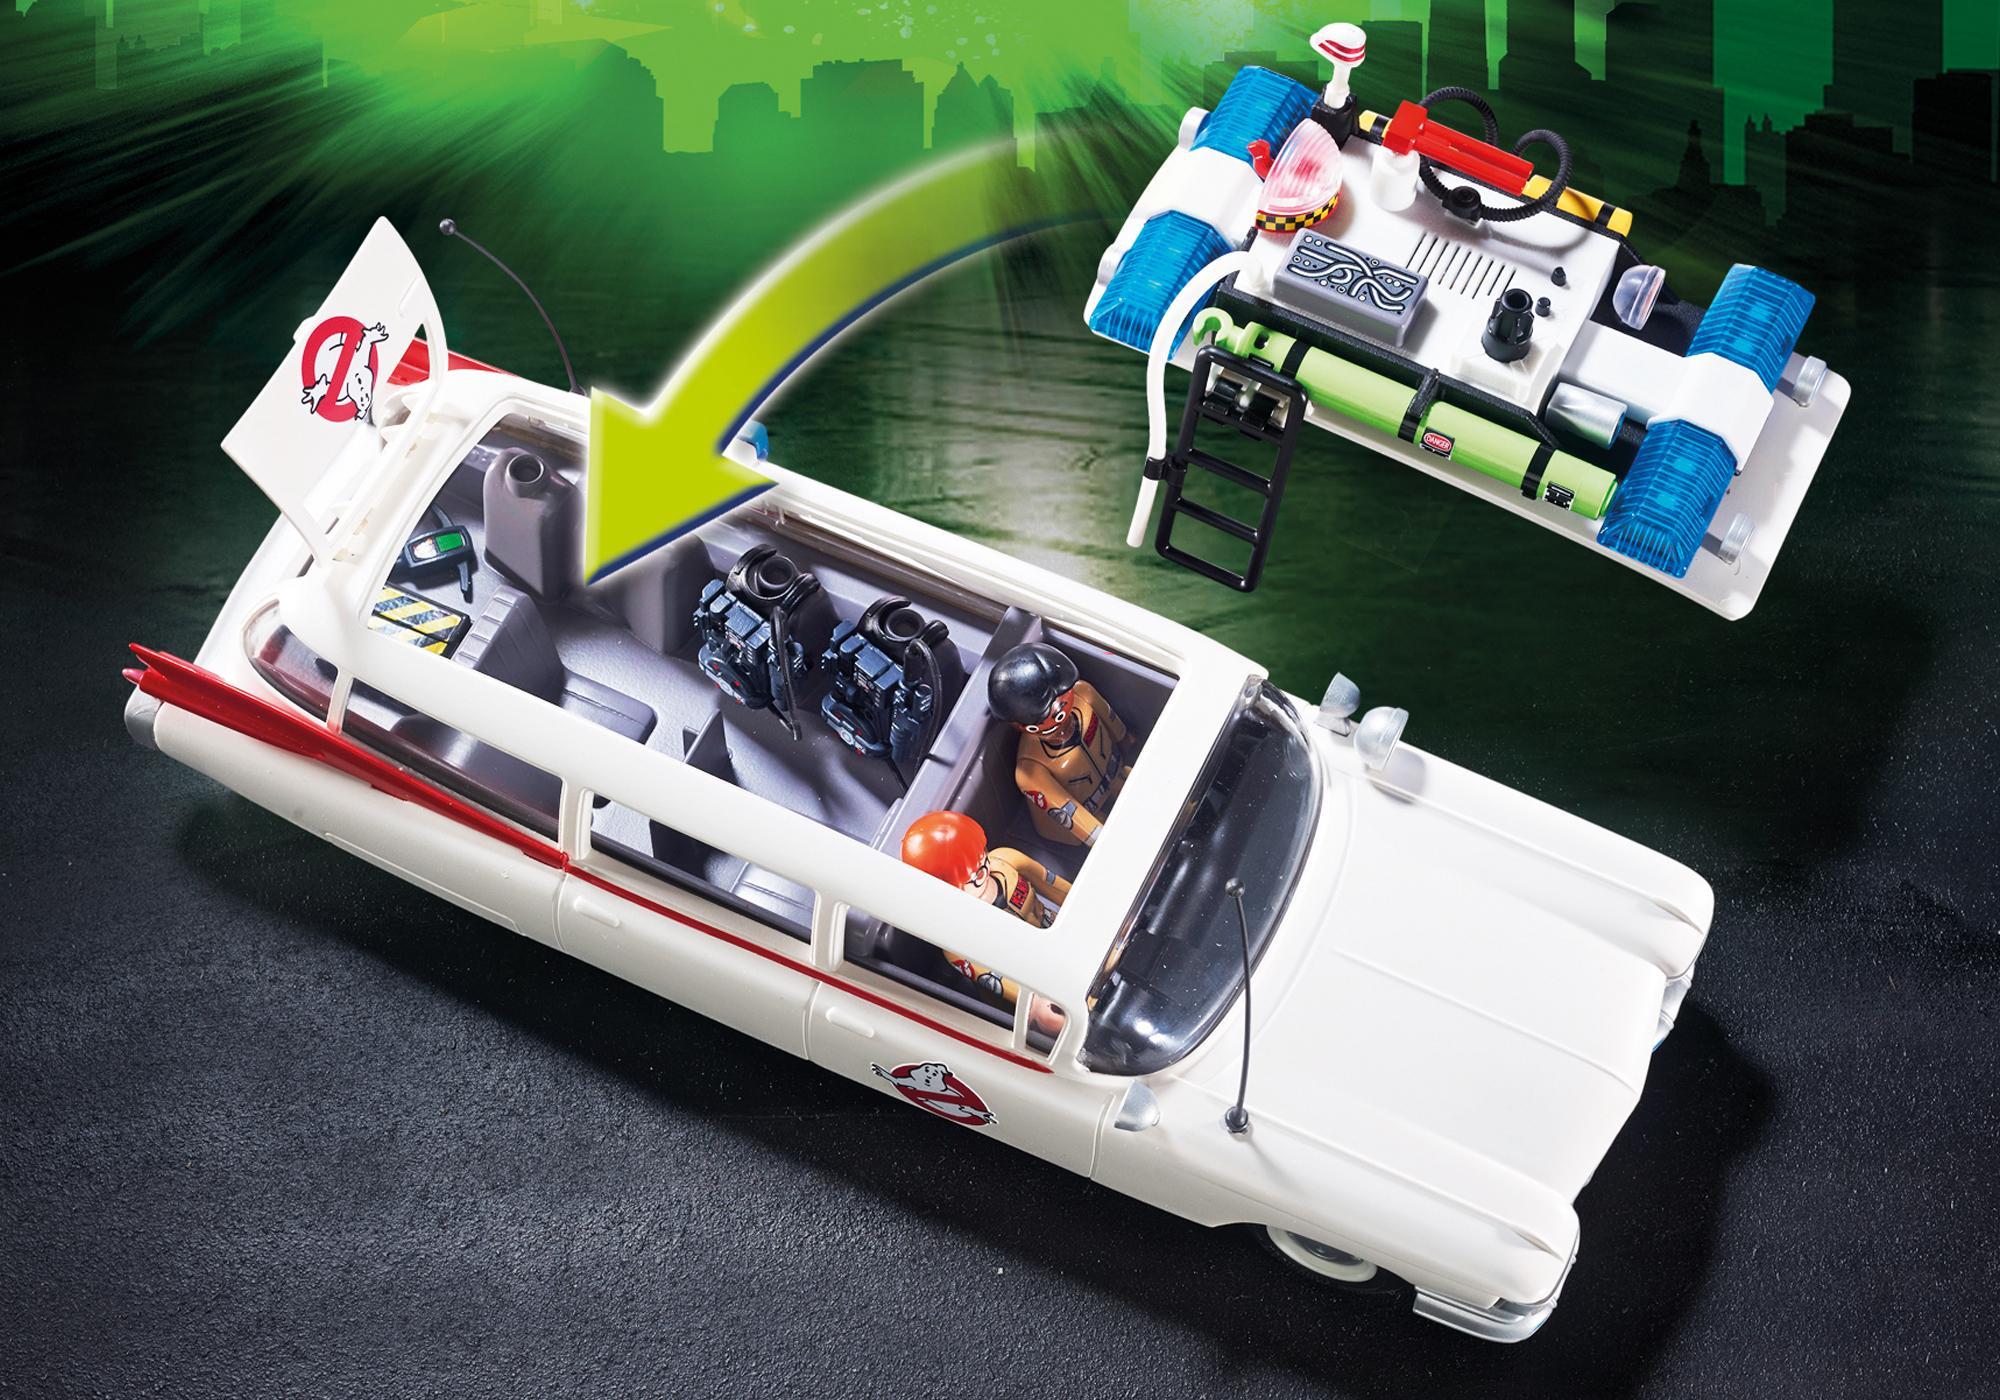 http://media.playmobil.com/i/playmobil/9220_product_extra2/Автомобиль Экто-1